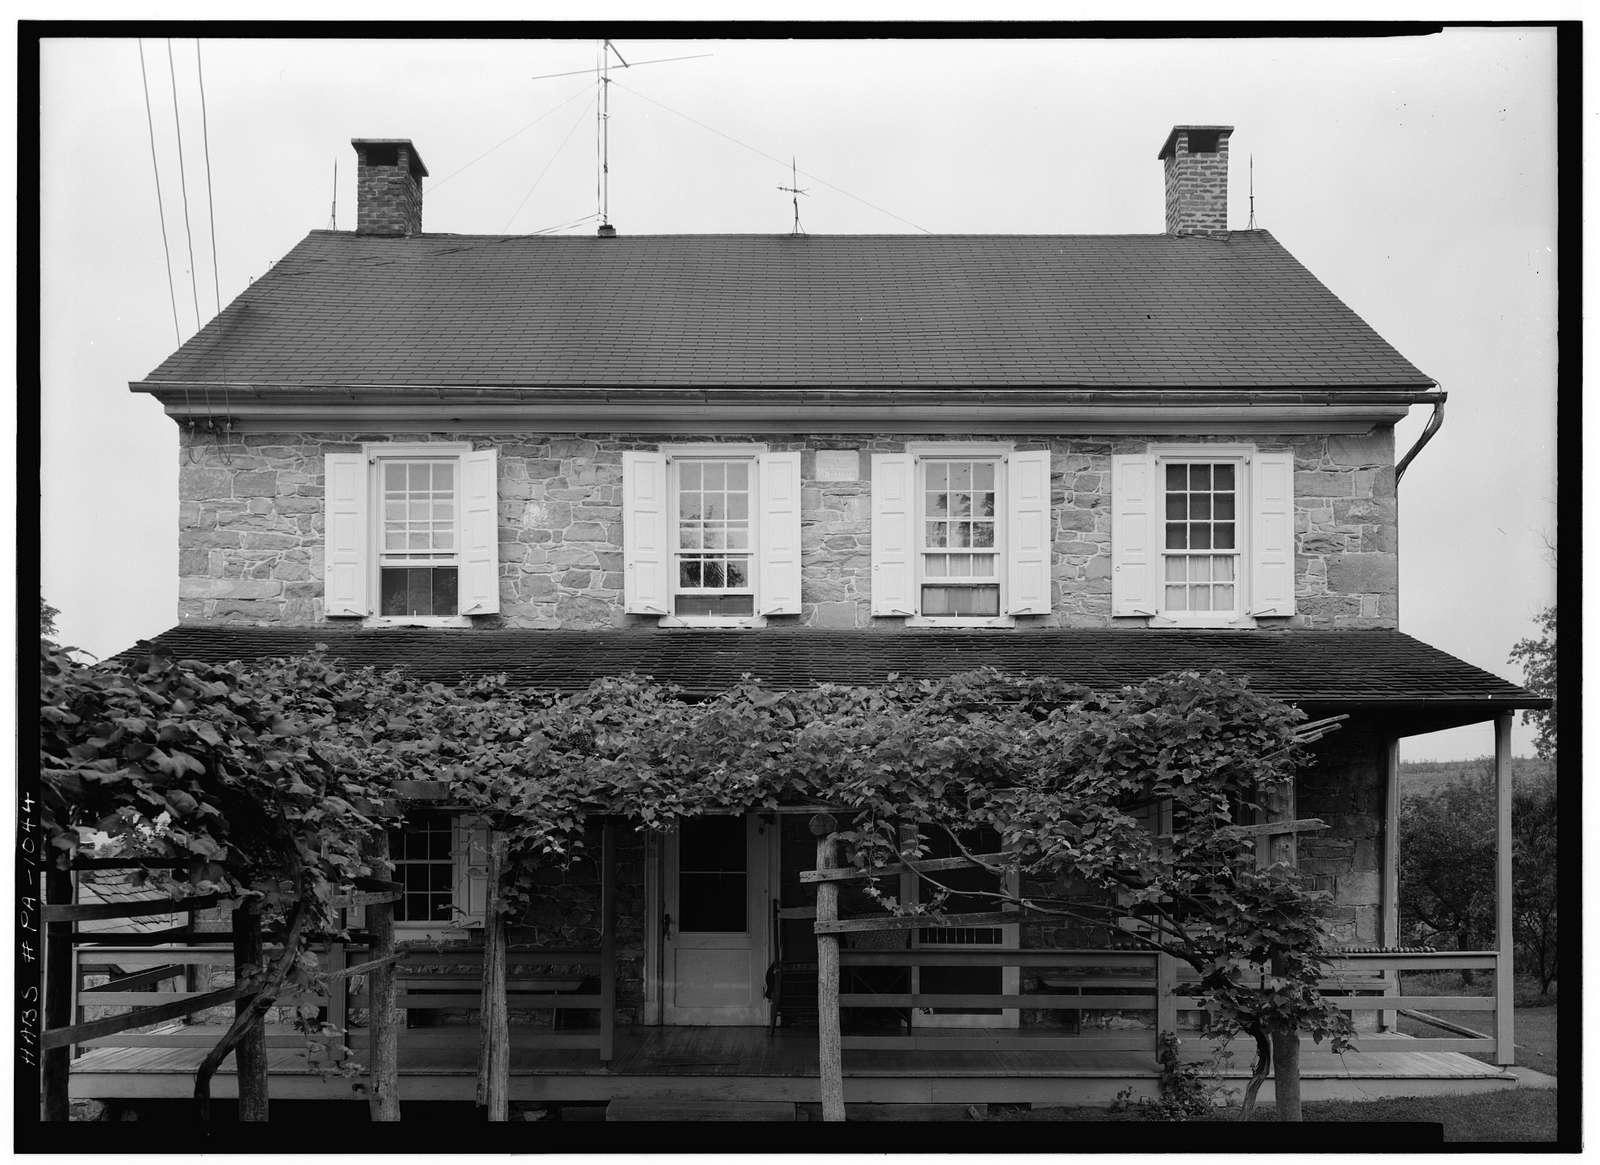 David Schneider House, (Oley Township), Oley Line, Berks County, PA